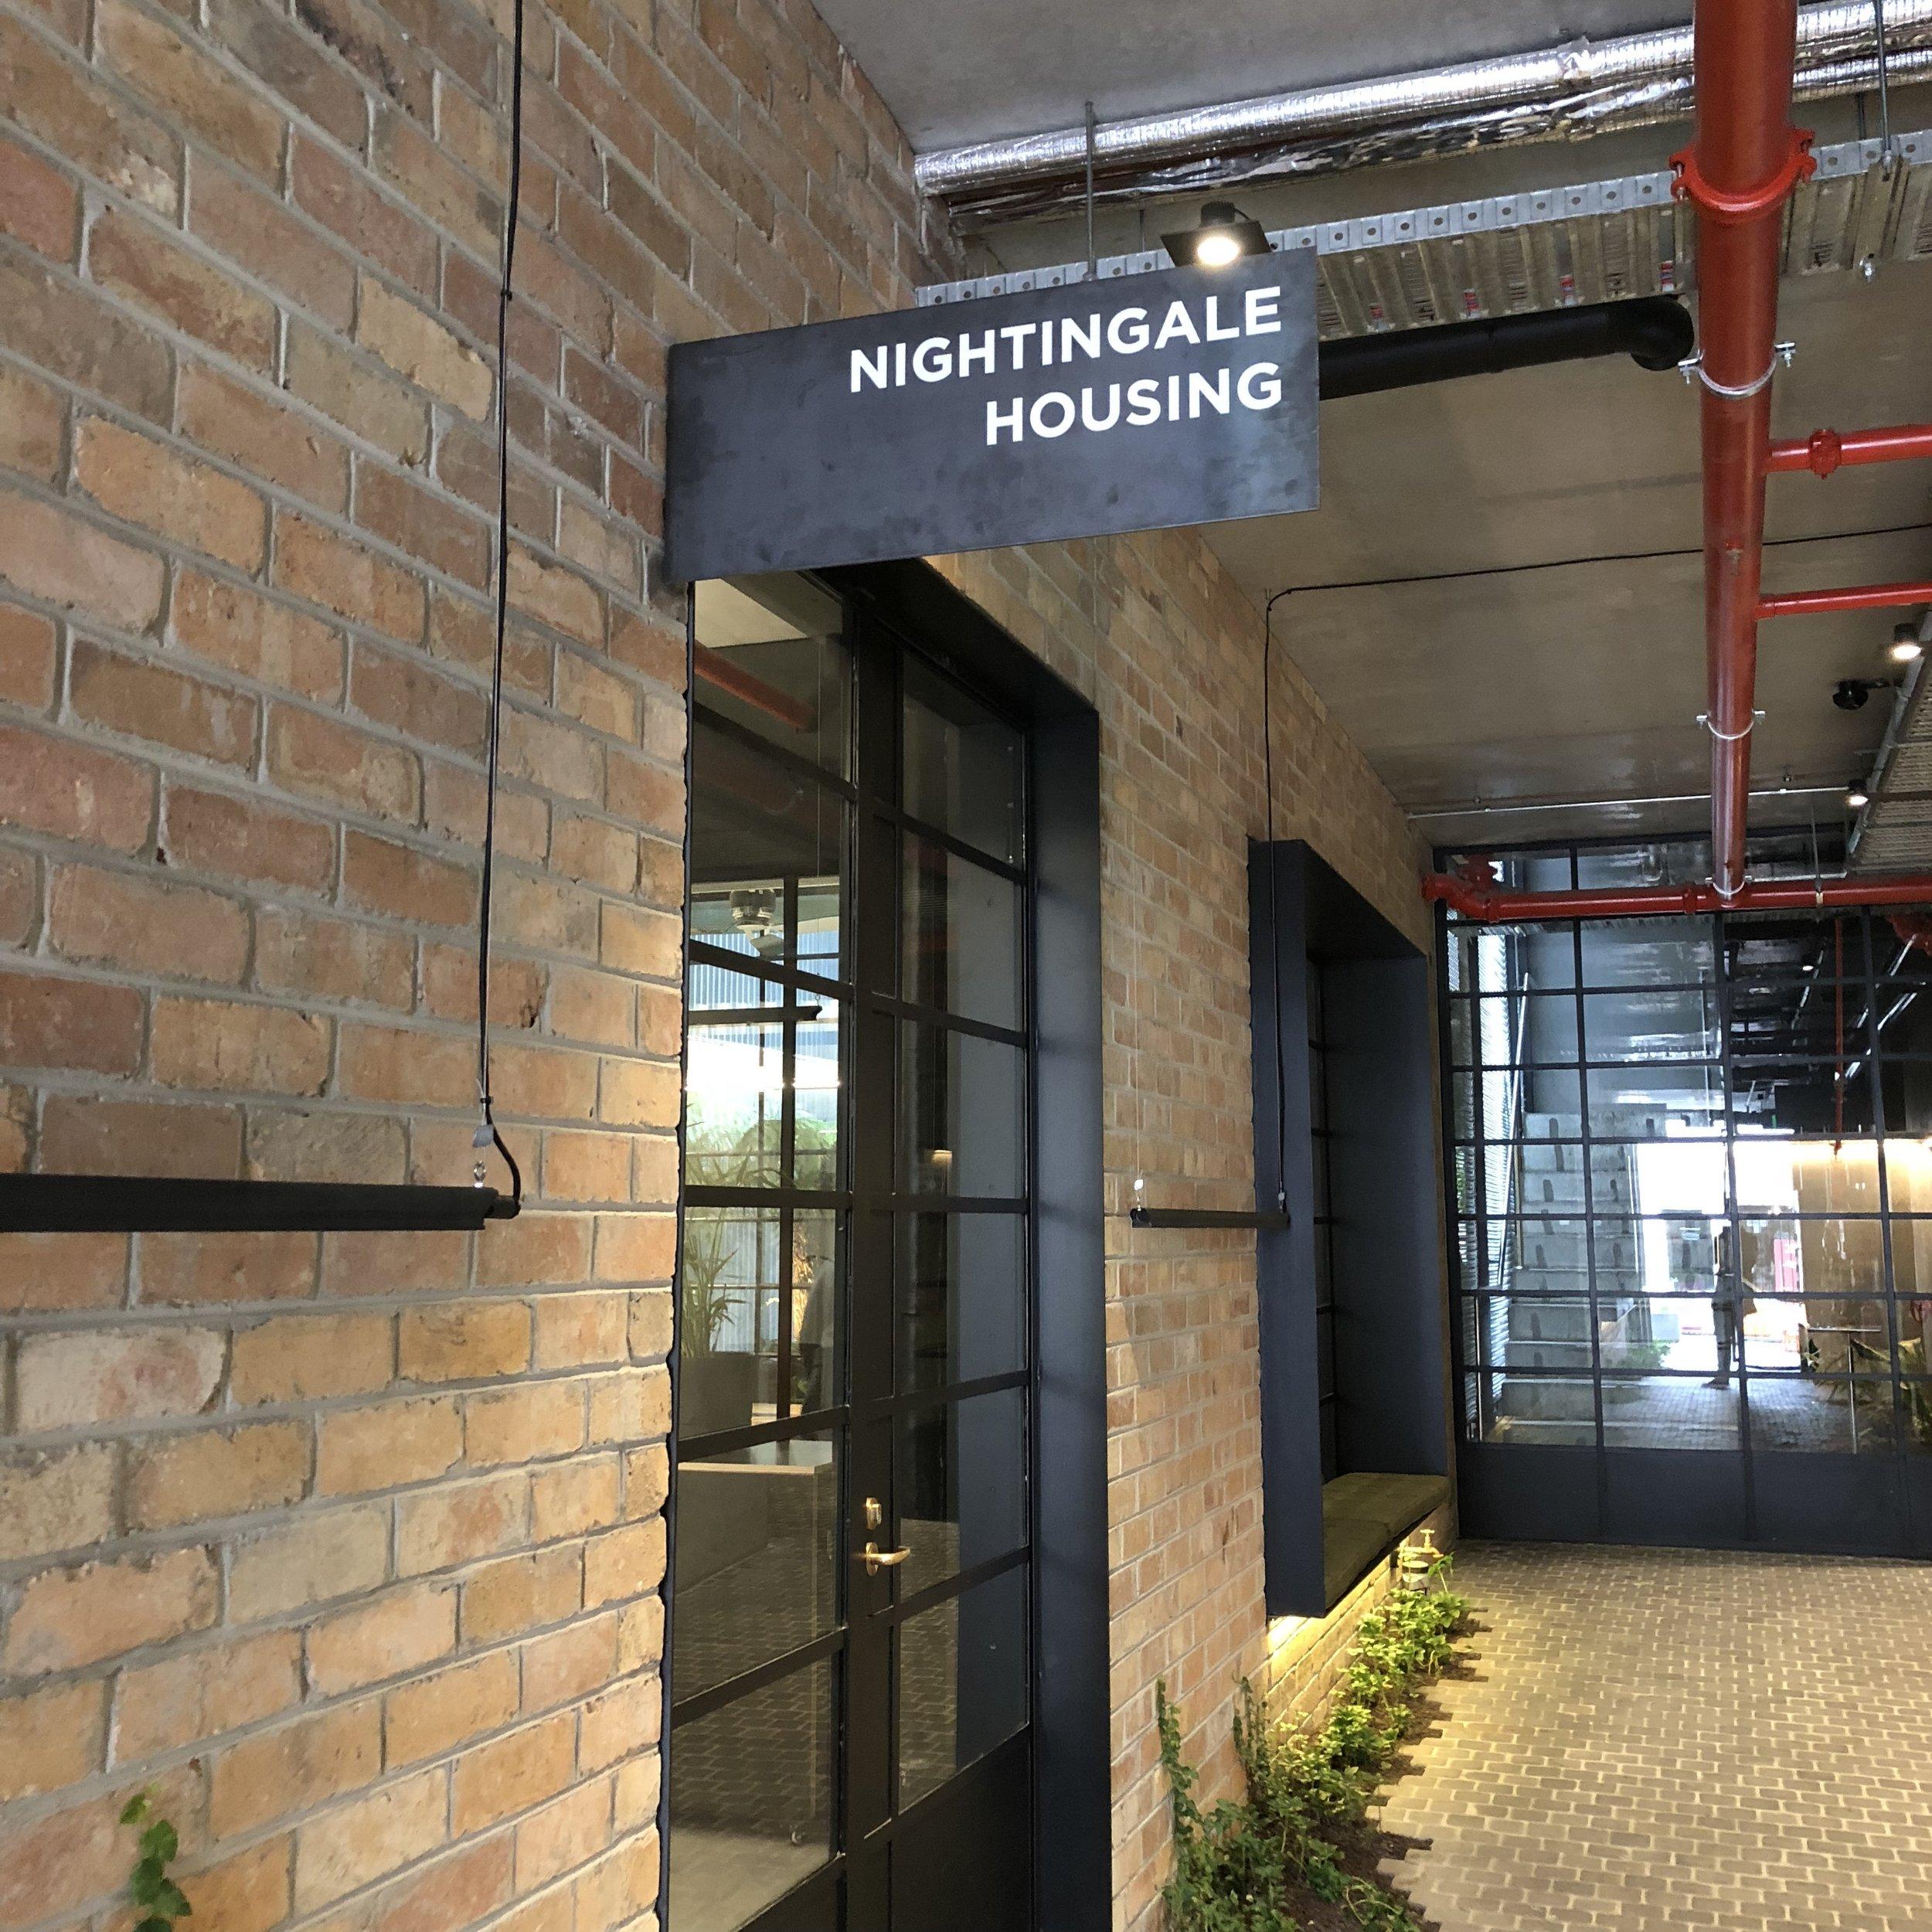 The Nightingale Housing office at Nightingale 1